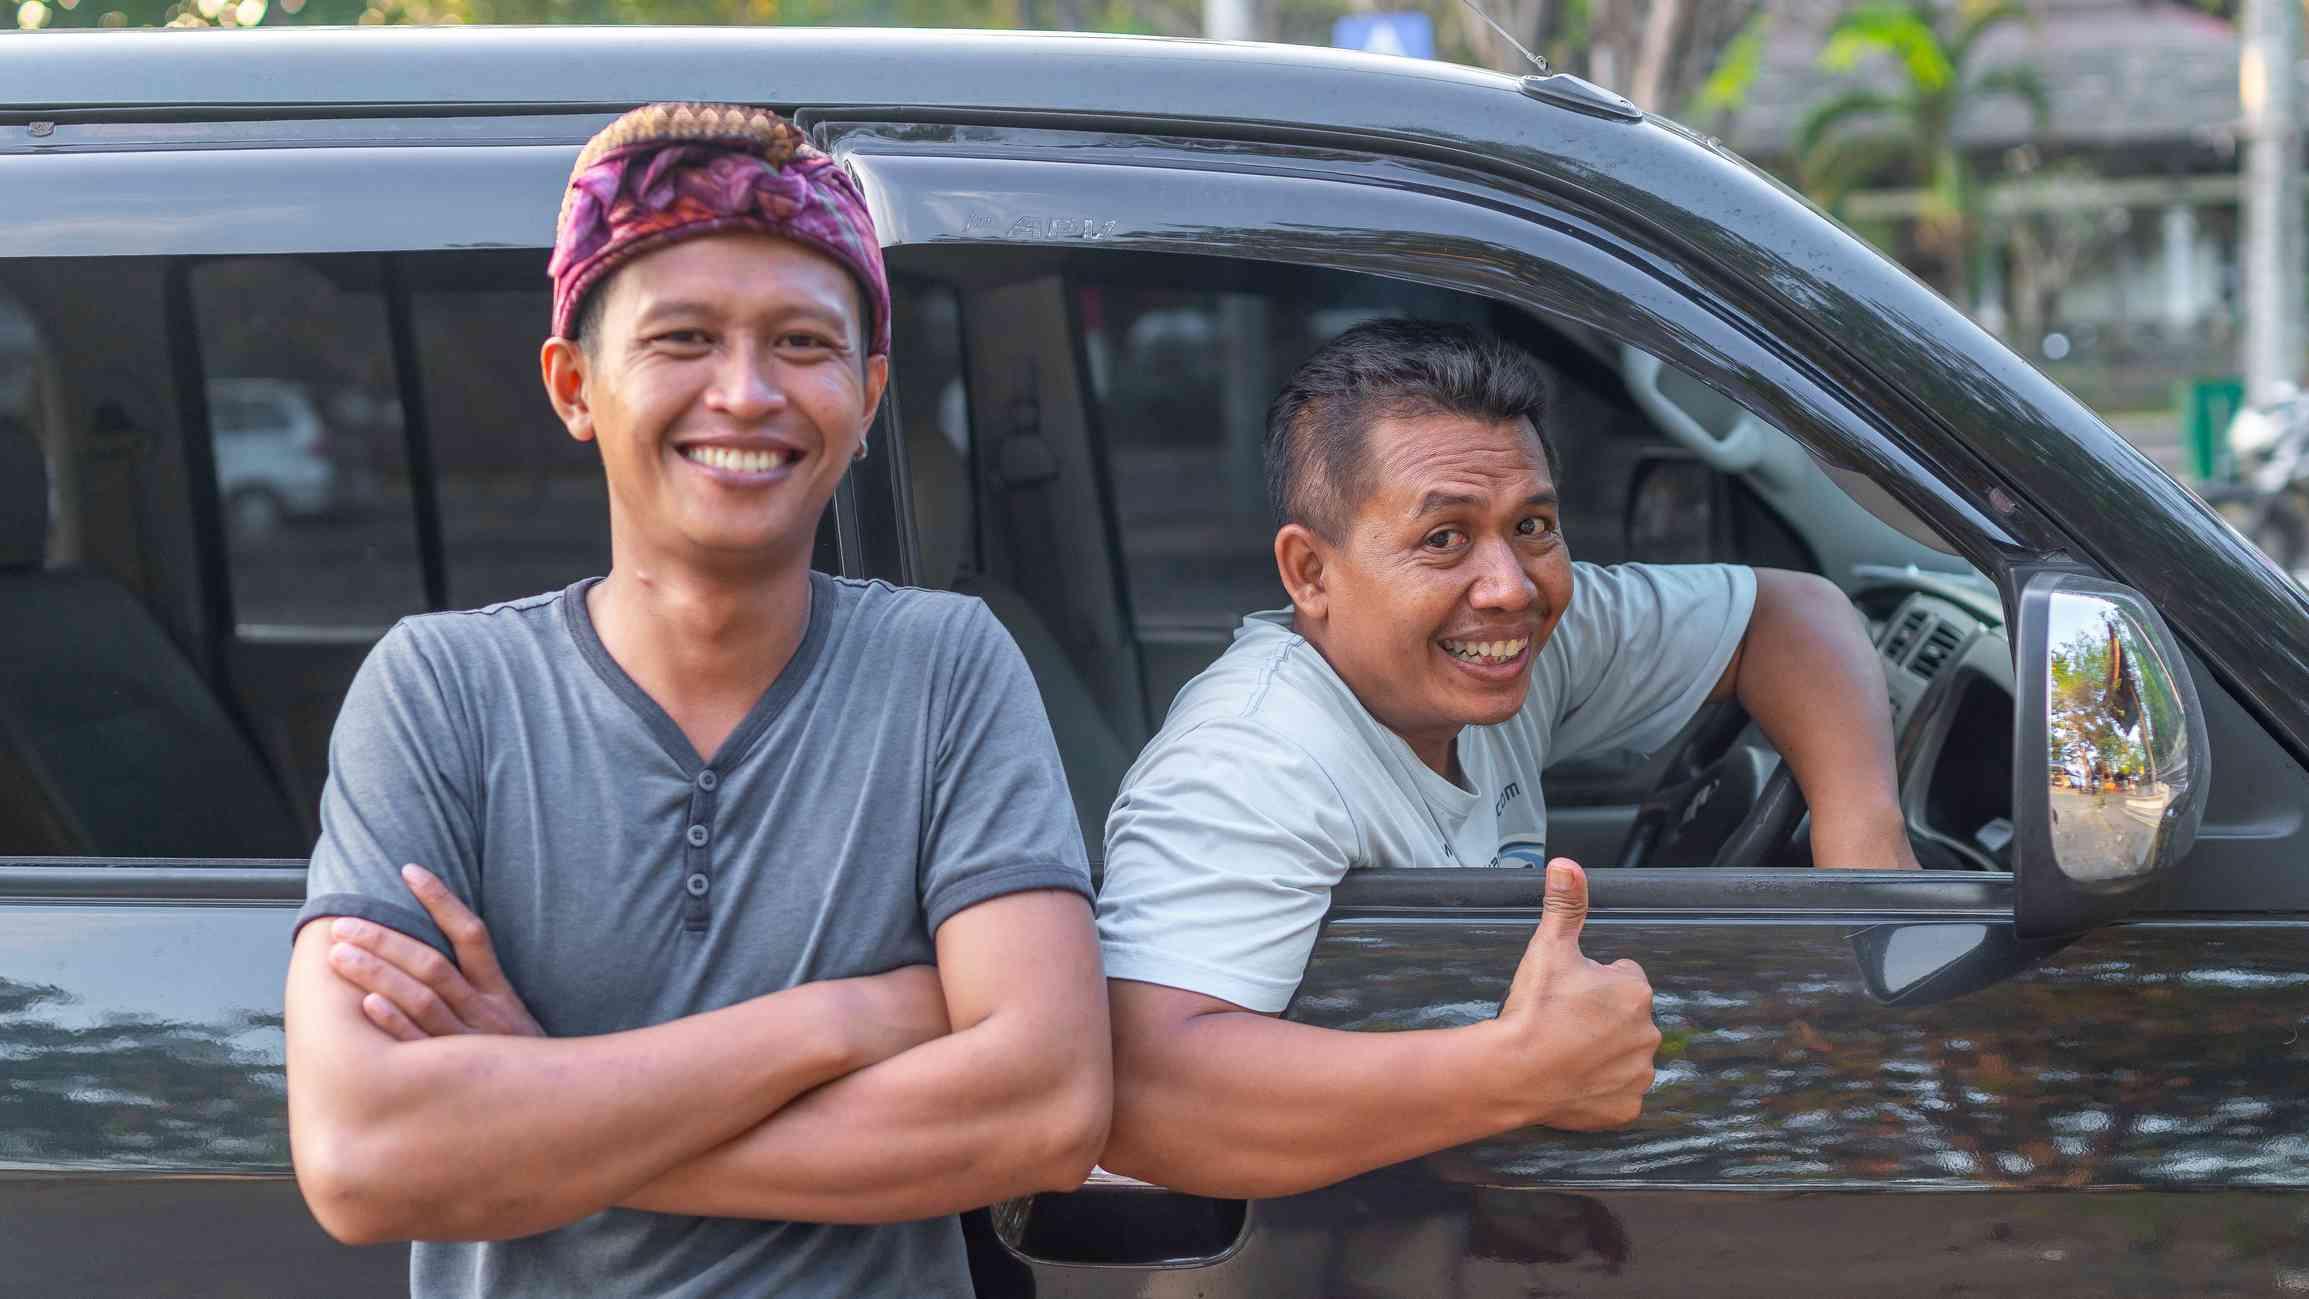 Tourist and driver in Bali, Indonesia